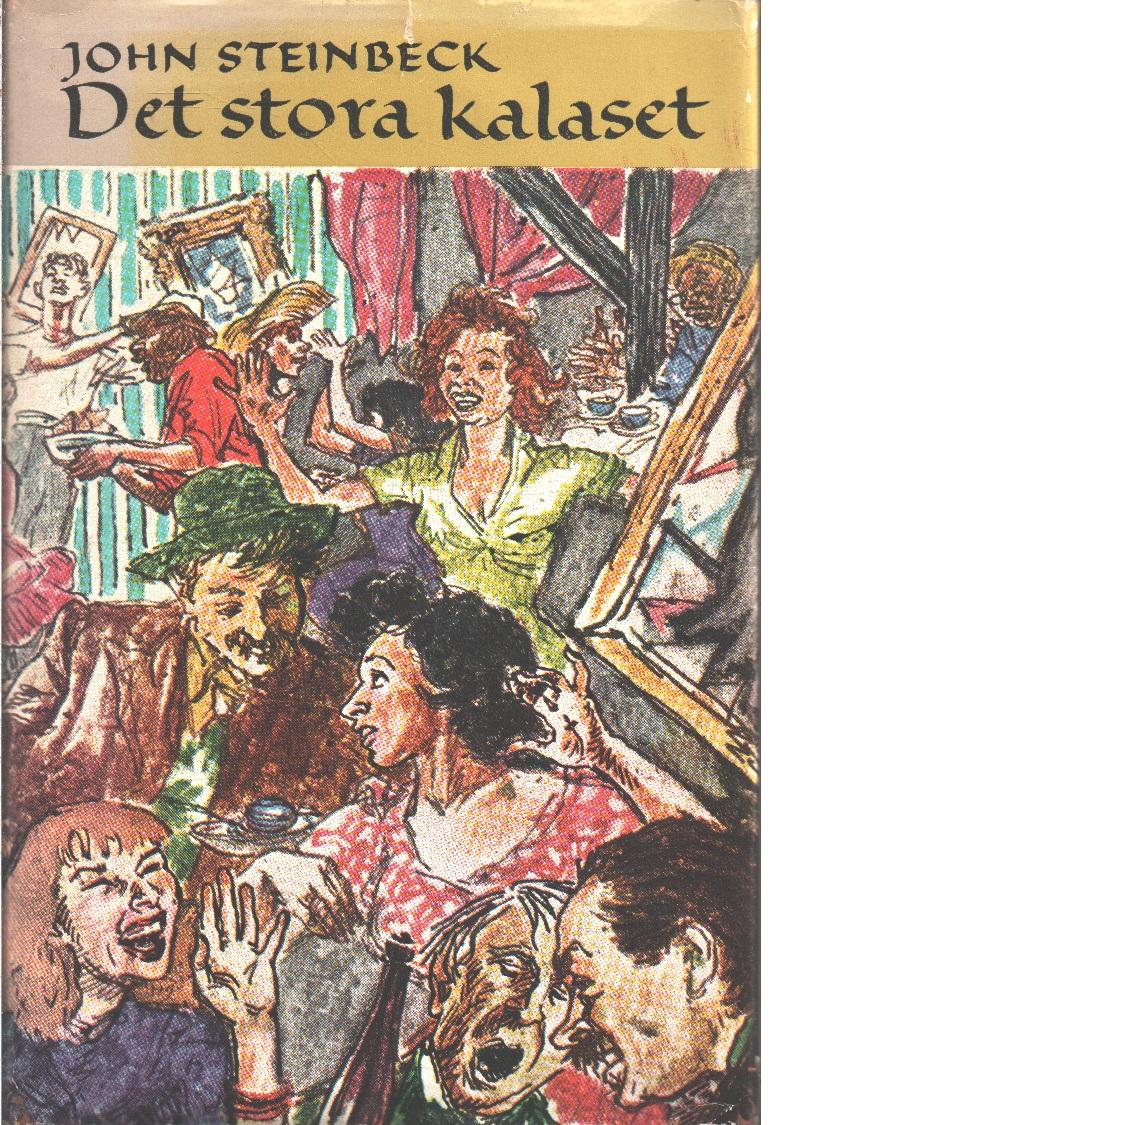 Det stora kalaset - Steinbeck, John